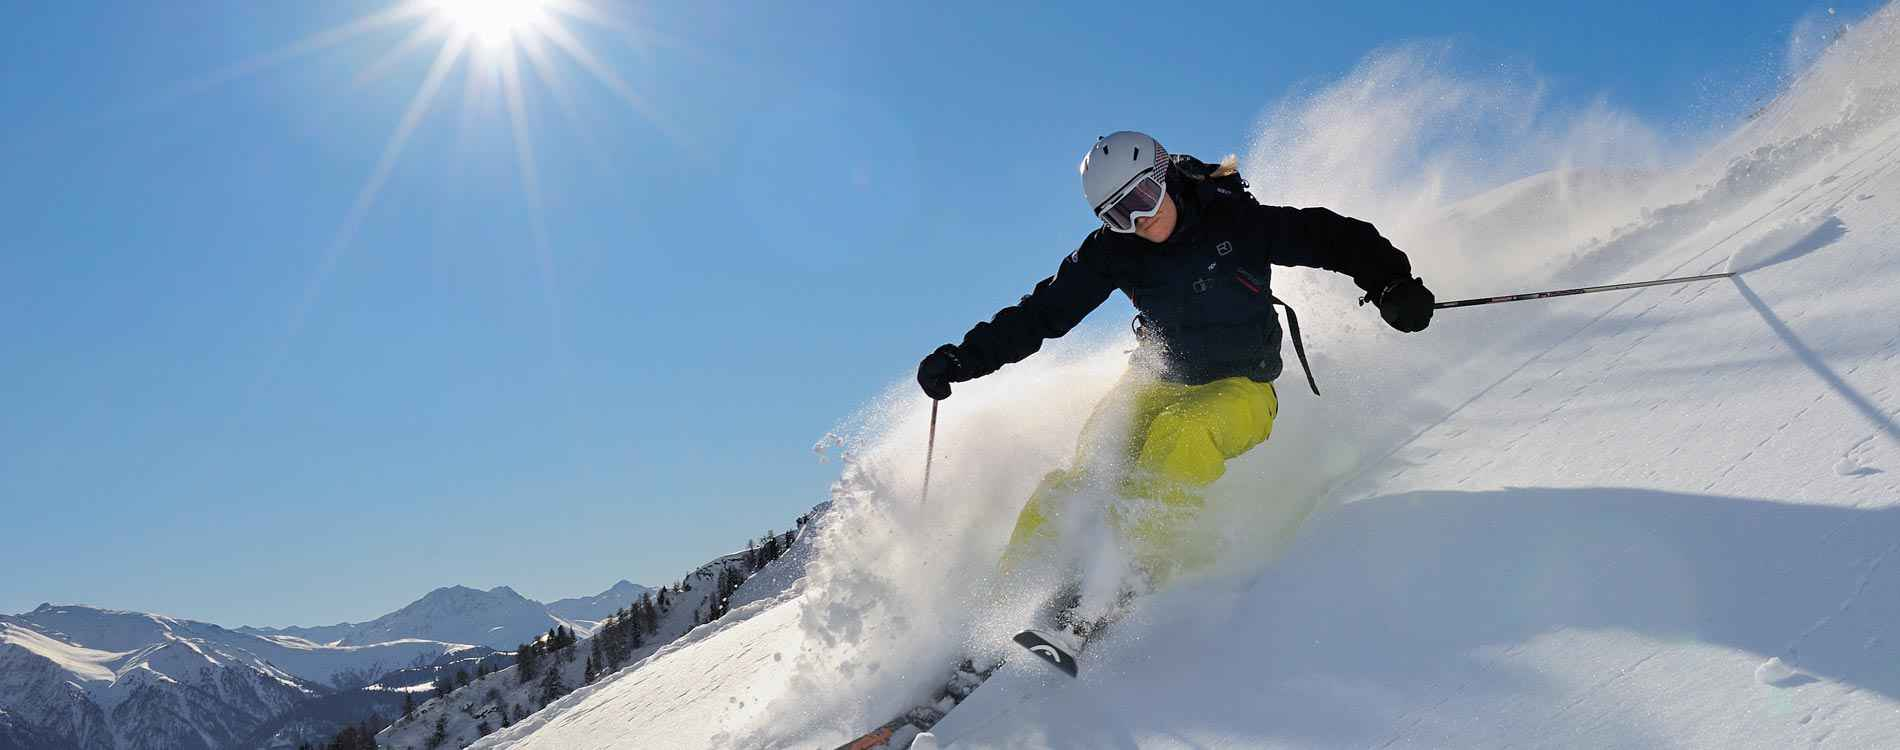 Easter skiing in Serfaus-Fiss-Ladis - HOTEL TIROL FISS Tyrol Austria - niche destinations